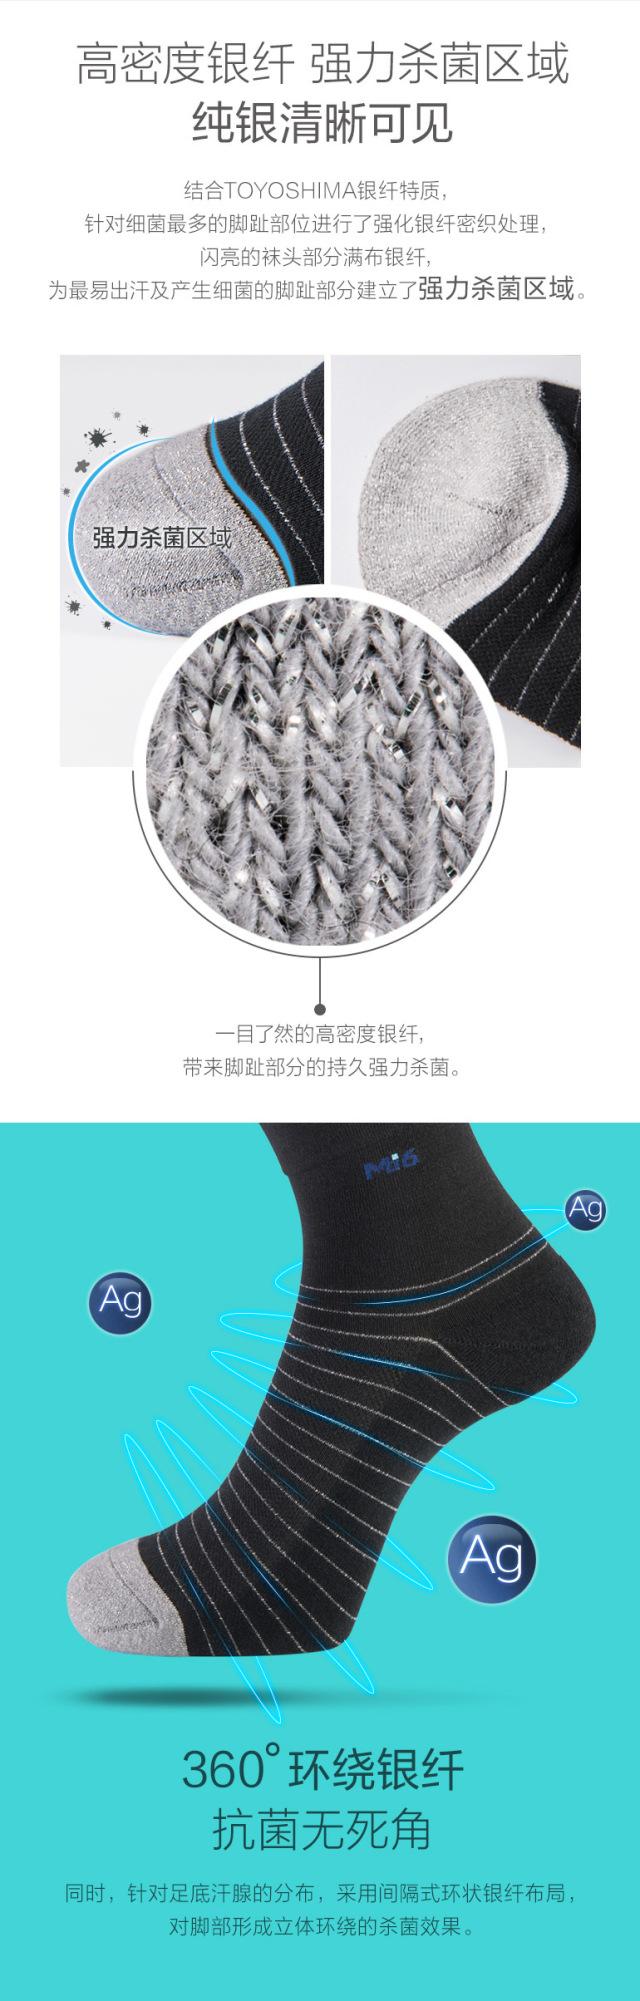 Mi6Design银纤抗菌袜子